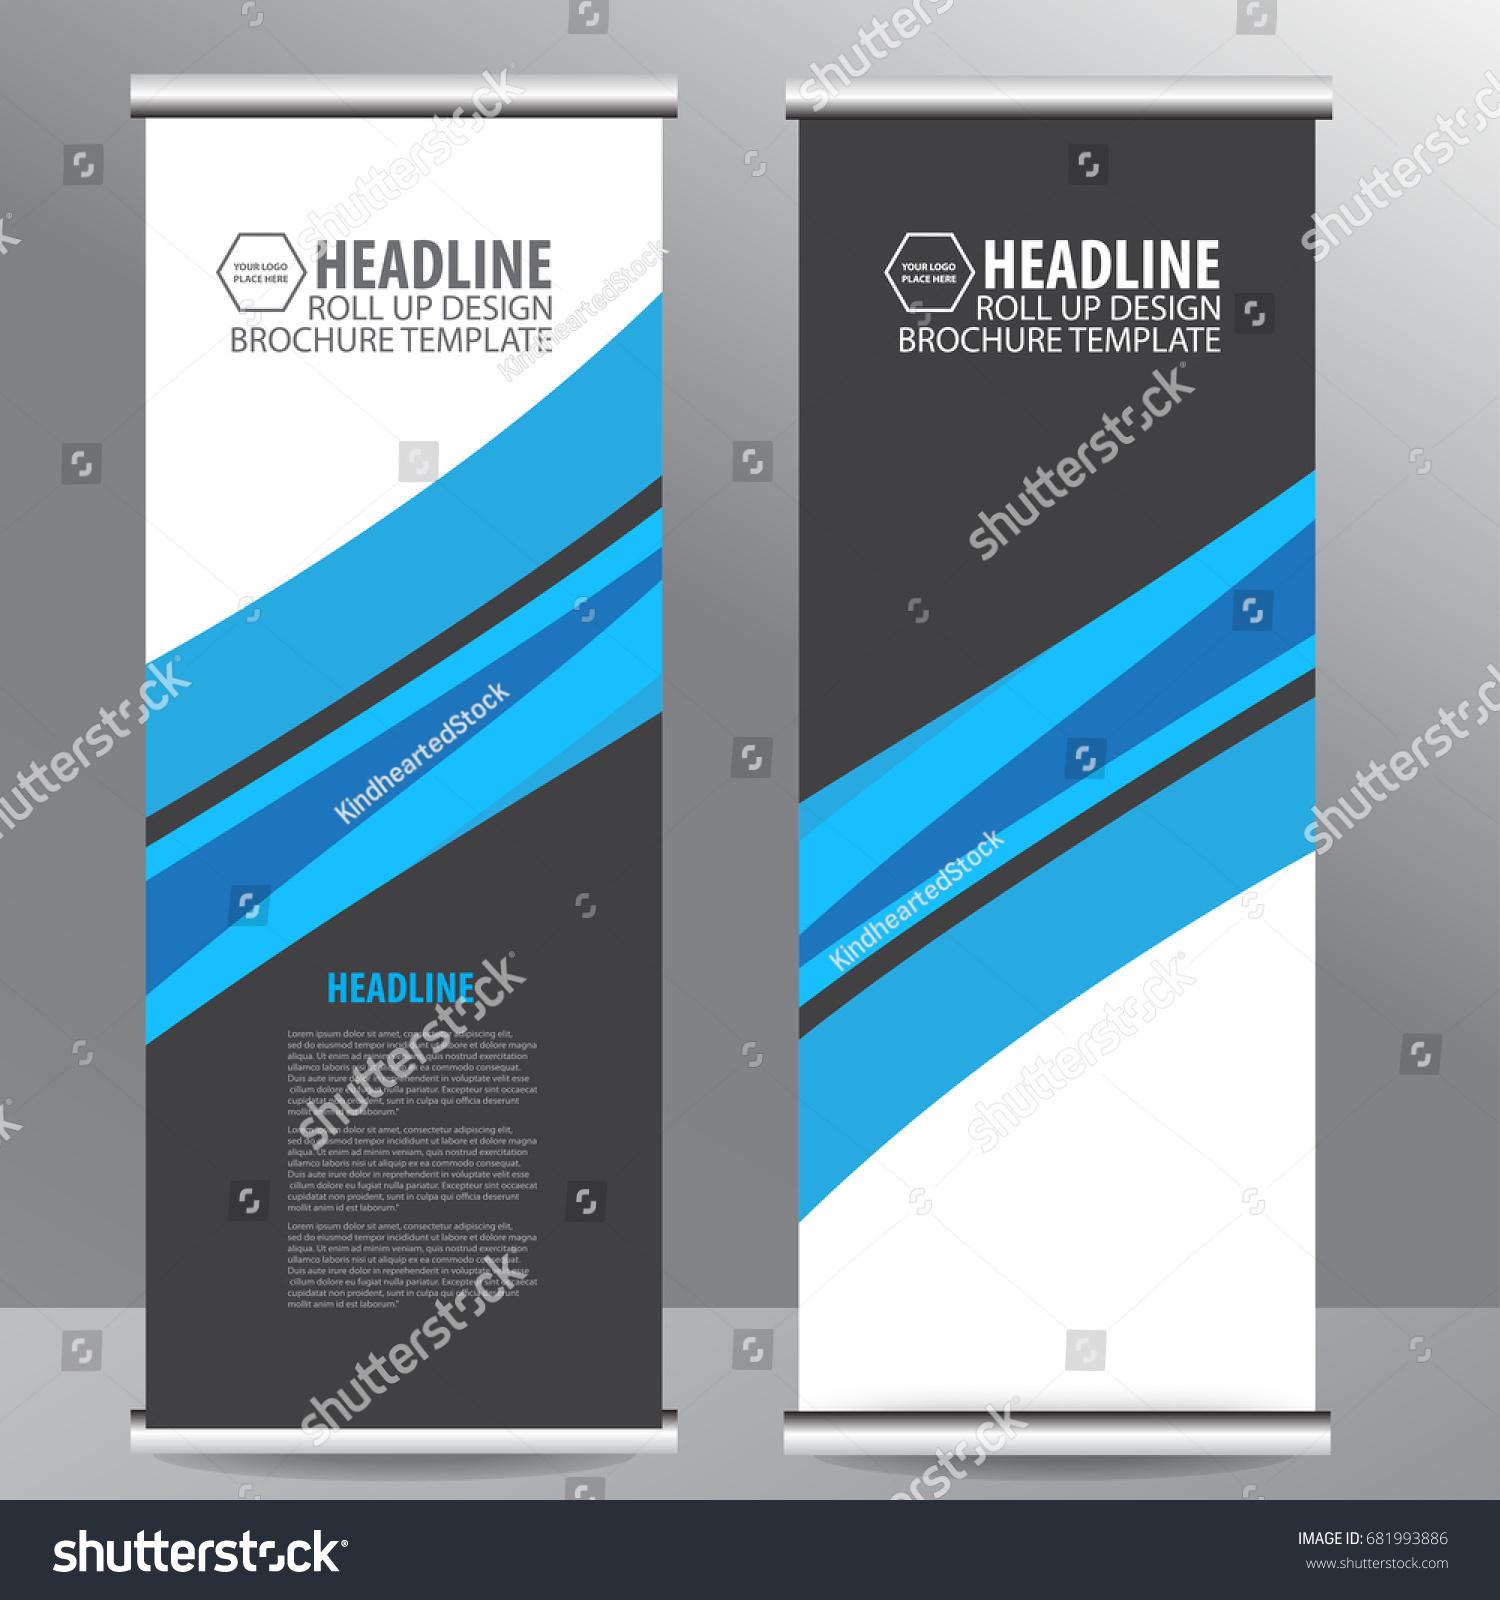 flyer blue - Onwe.bioinnovate.co